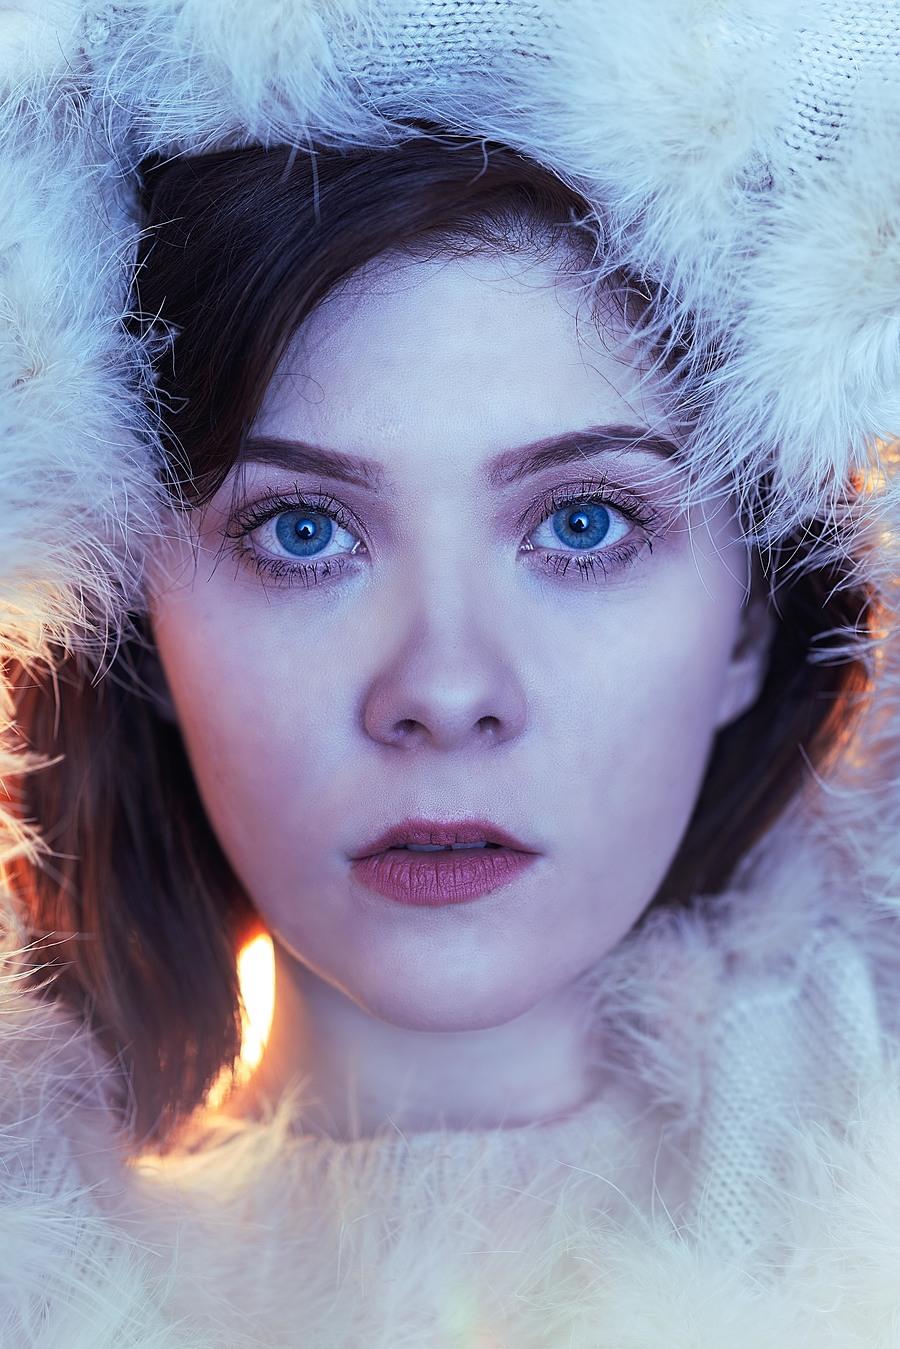 Ice Glow / Photography by David Abbs, Model Brogan Alexandra, Taken at Studio 33 / Uploaded 1st October 2018 @ 08:50 PM